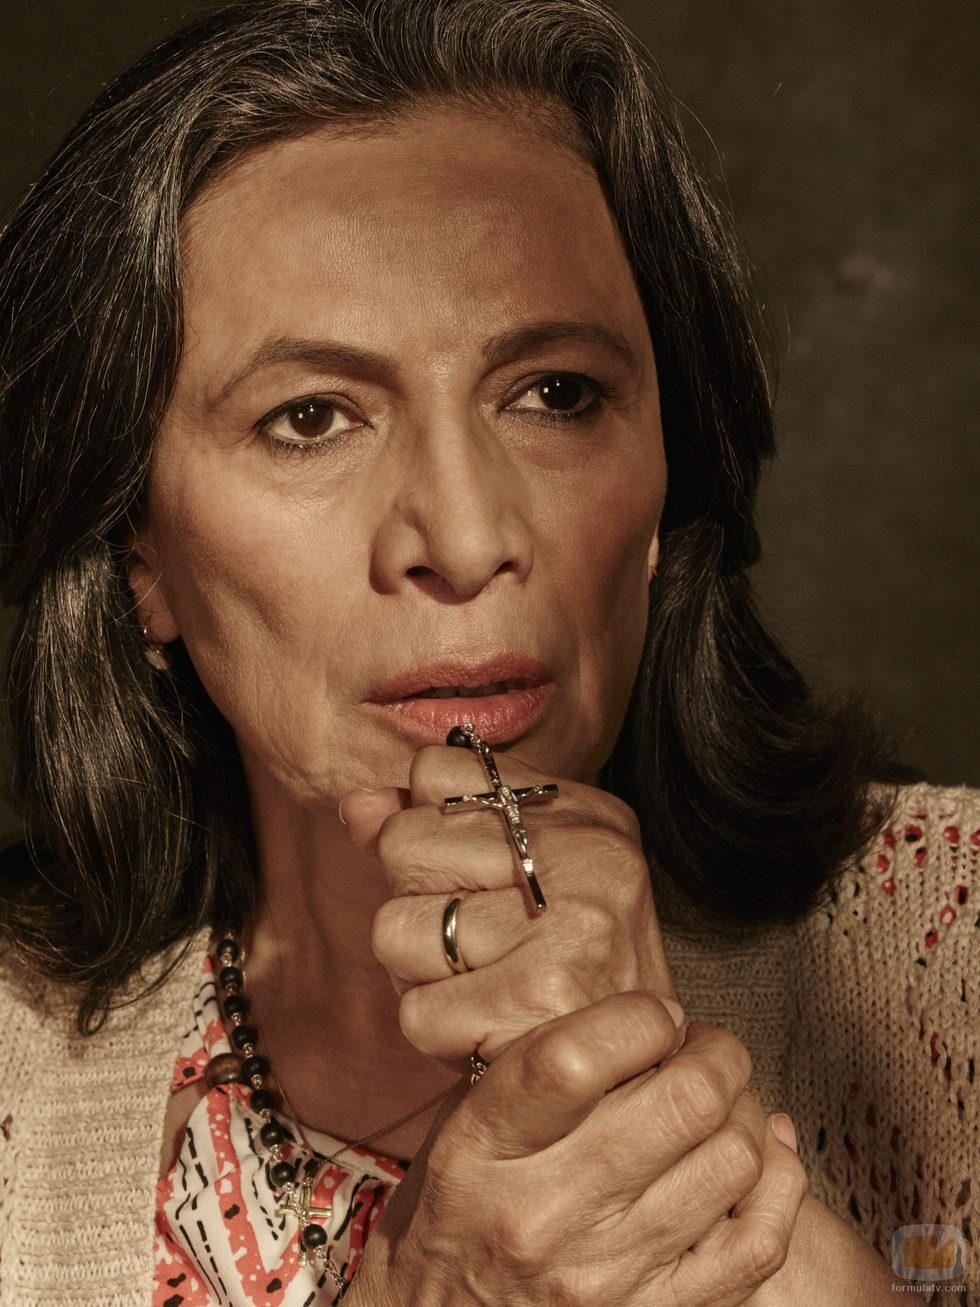 Patricia Reyes Spindola en 'Fear The Walking Dead' - 47434_patricia-reyes-spindola-fear-the-walking-dead